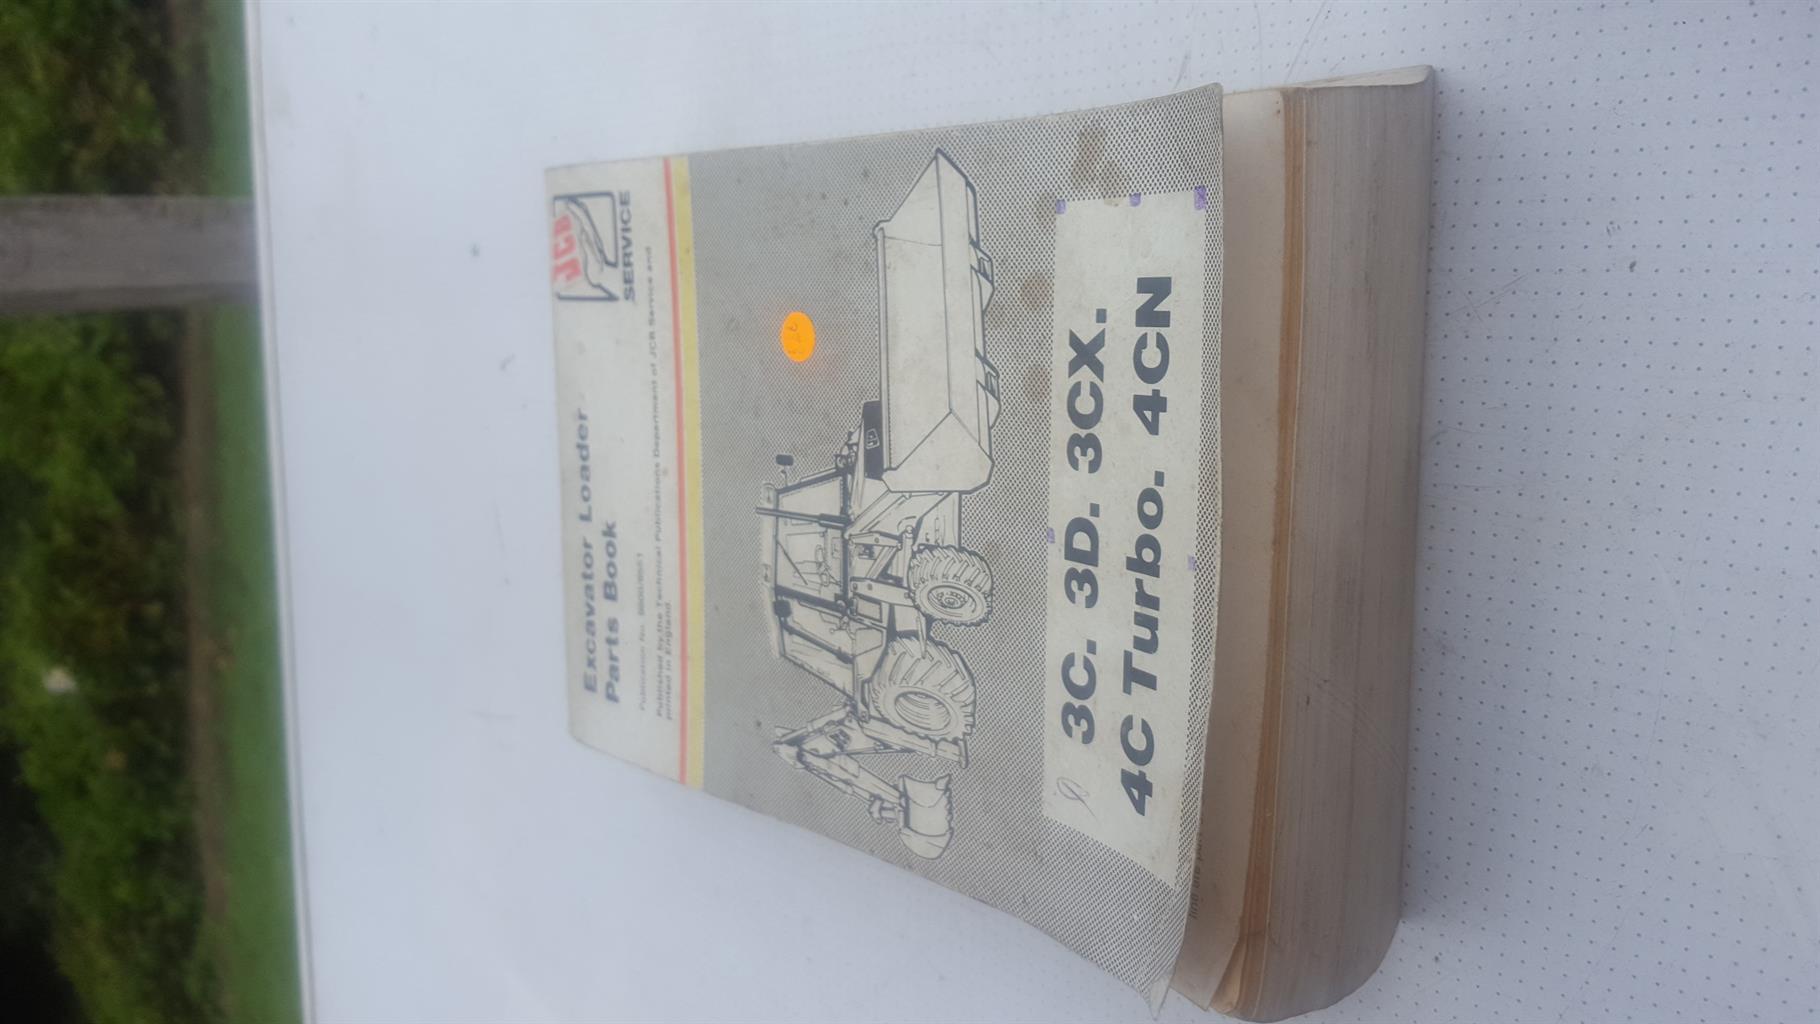 Excavator loader parts book